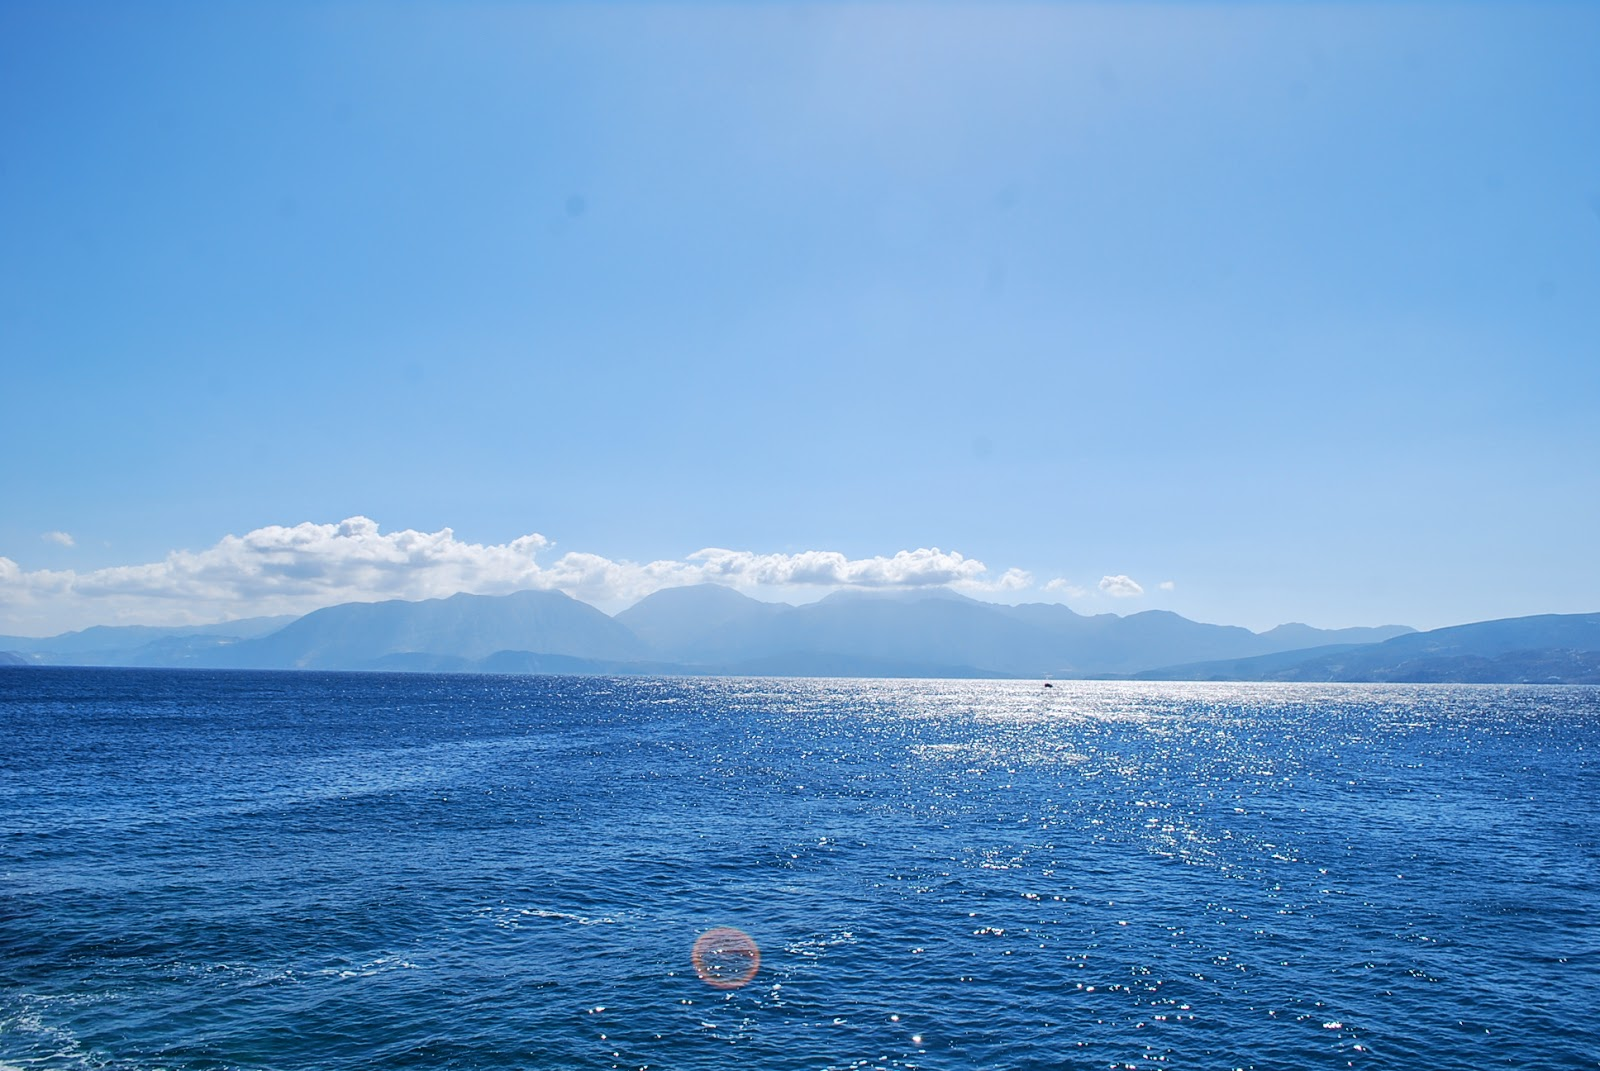 Вид на залив Мирабелла, Агиос Николаос, Крит. Agios Nikolaos, Crete.